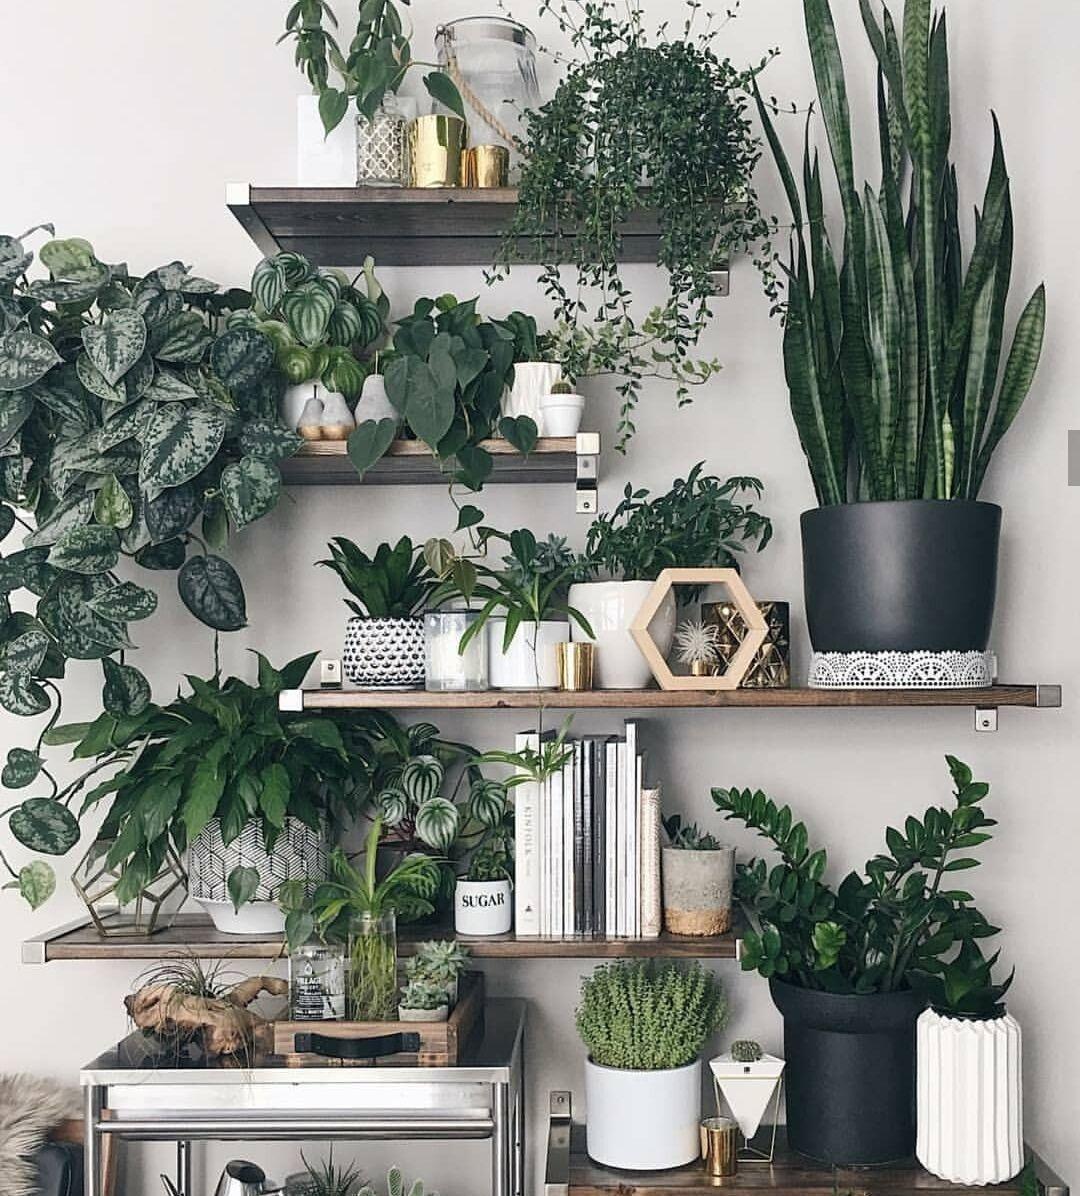 pin von plantura garten ideen tipp auf zimmerpflanzen on sweet dreams for your home plants decoration precautions and options id=63275